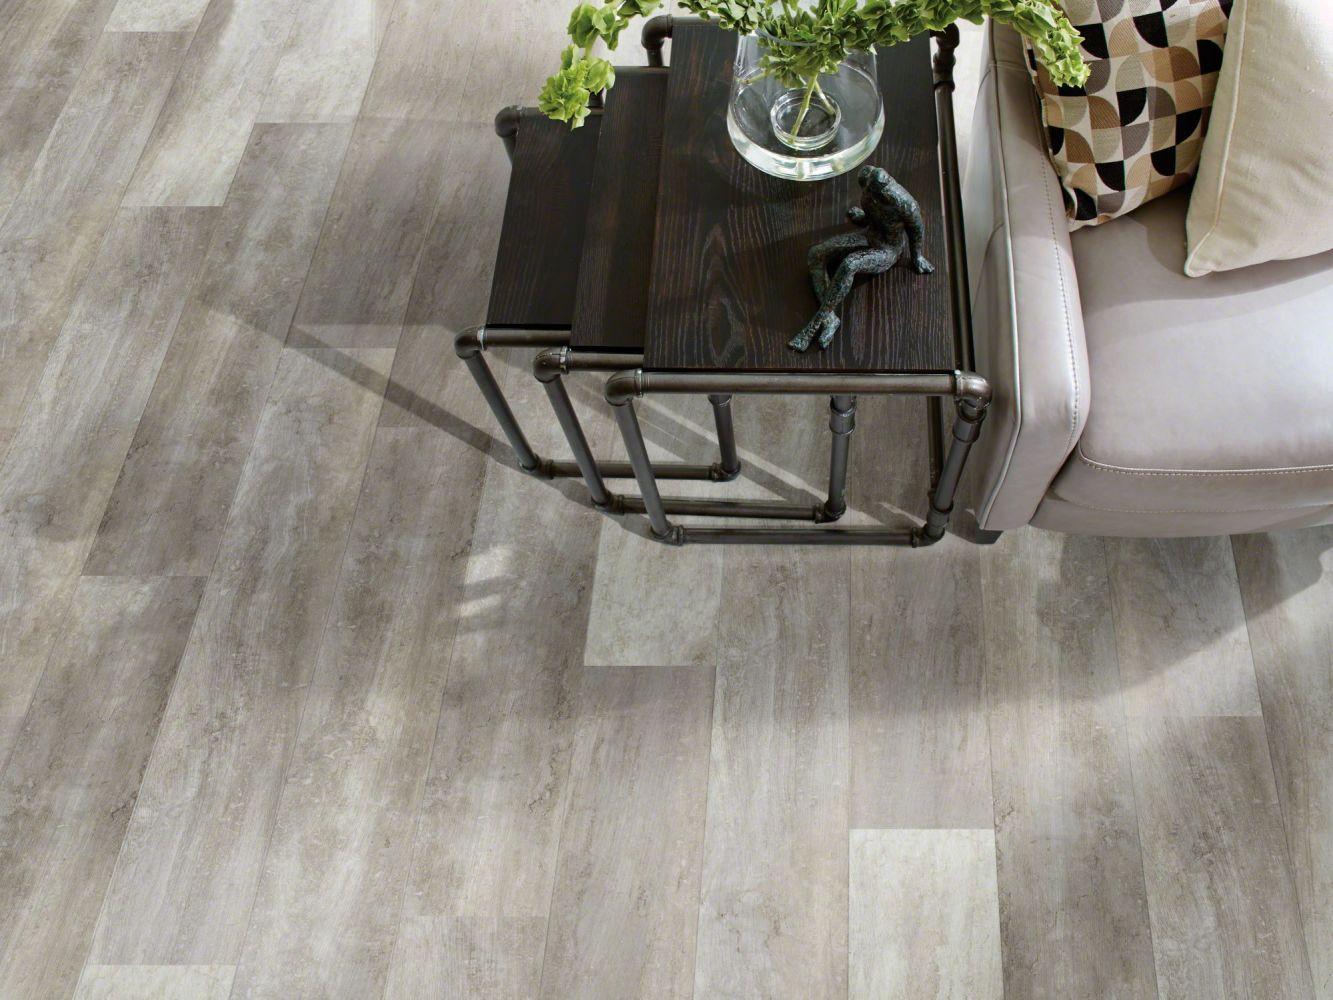 Shaw Floors Dr Horton Ballantyne Plus Click Shadow Oak 00592_DR036